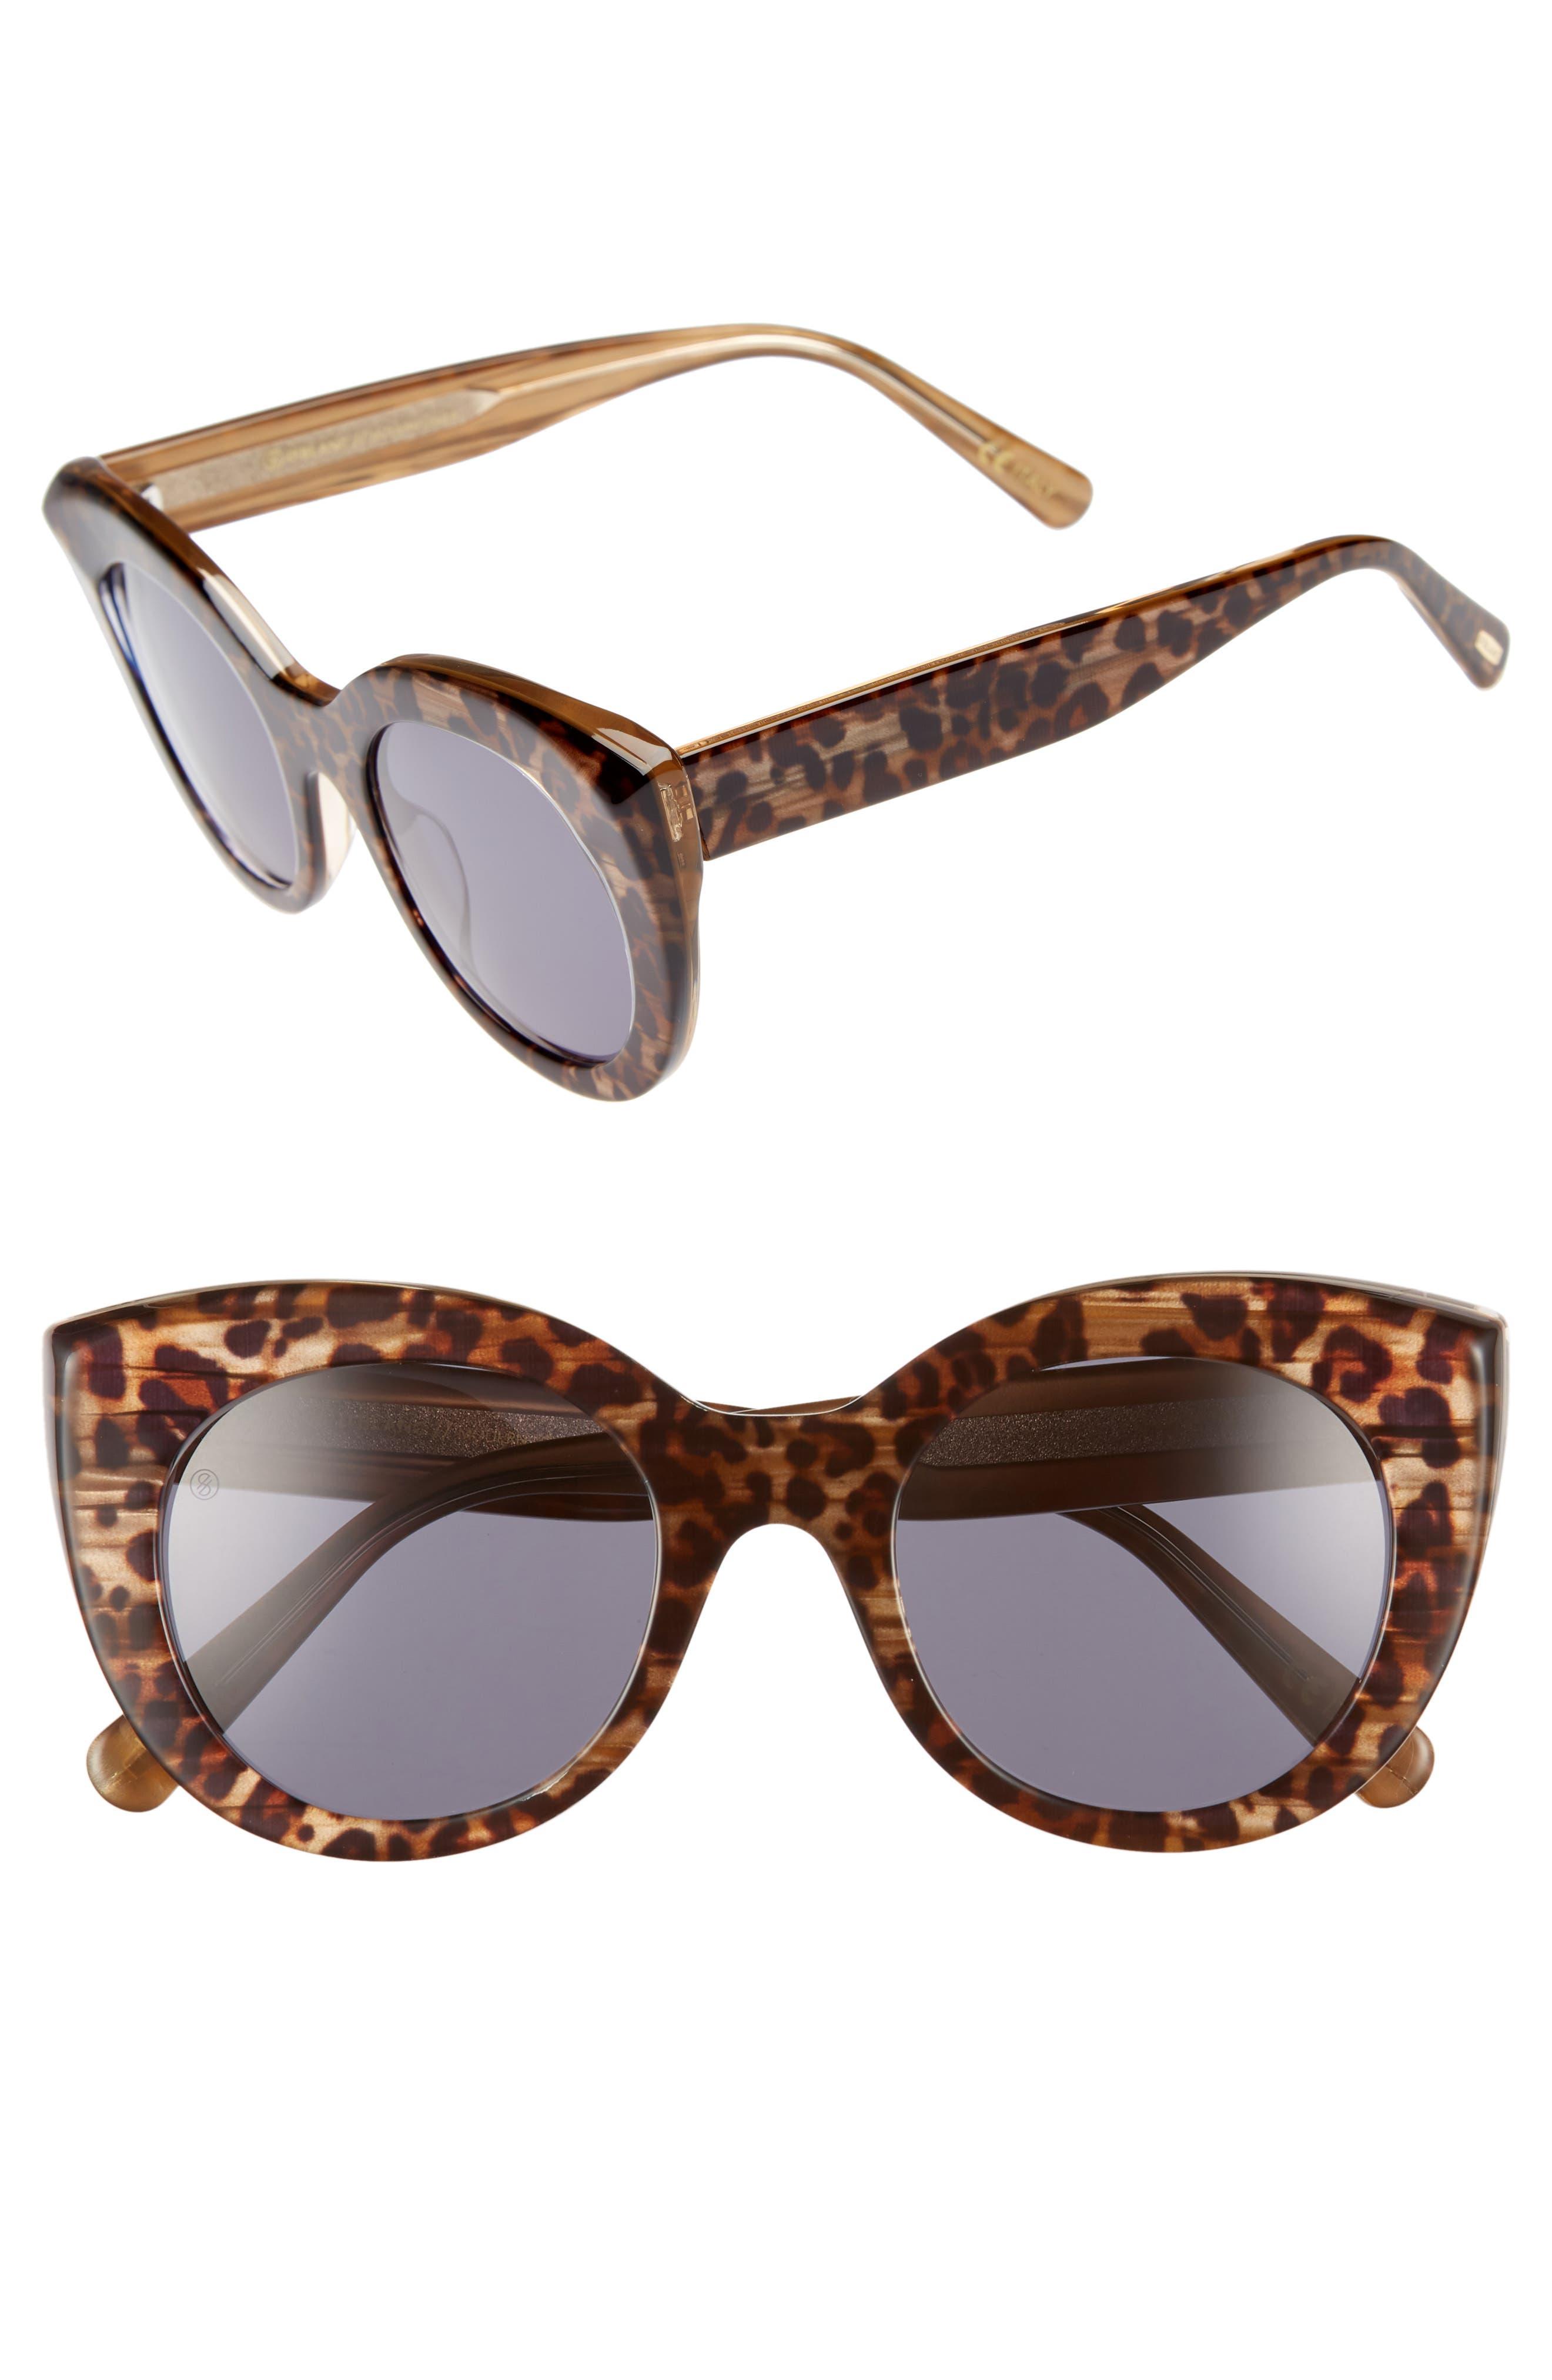 D'BLANC x Amuse Society Modern Lover 51mm Cat Eye Sunglasses,                         Main,                         color, Cheetah/ Grey